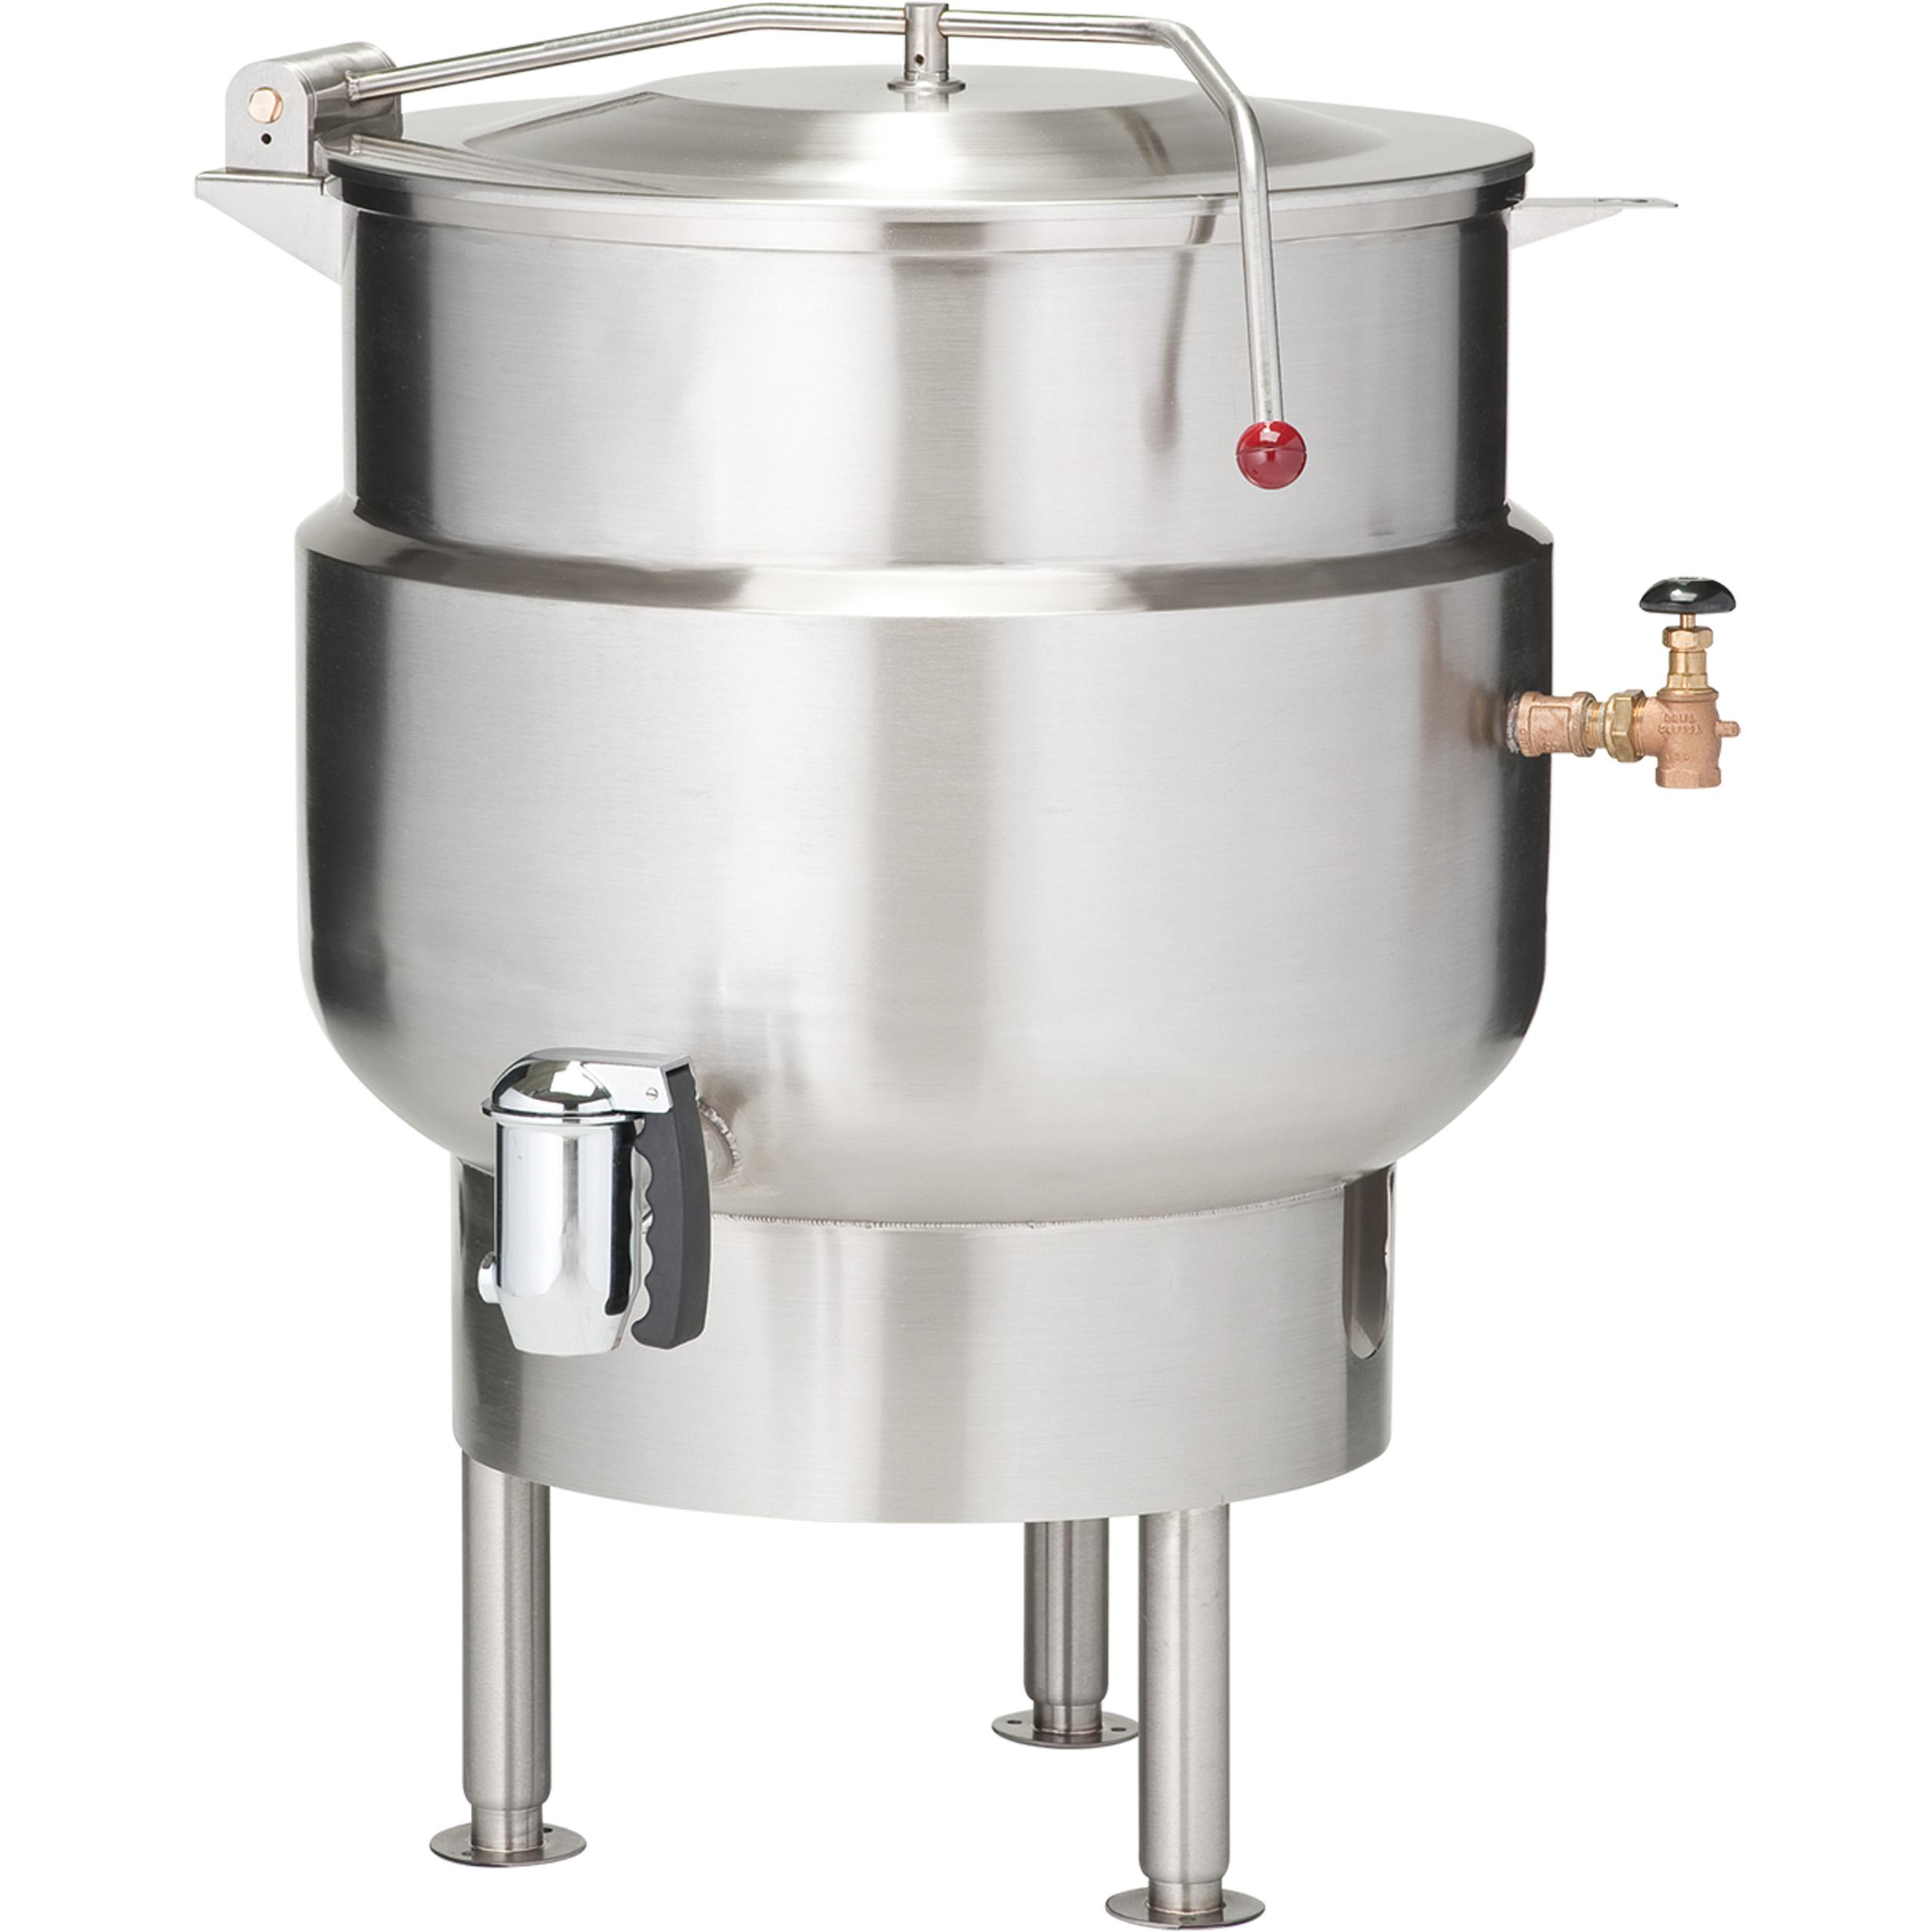 Vulcan K40DL kettle, direct steam, stationary